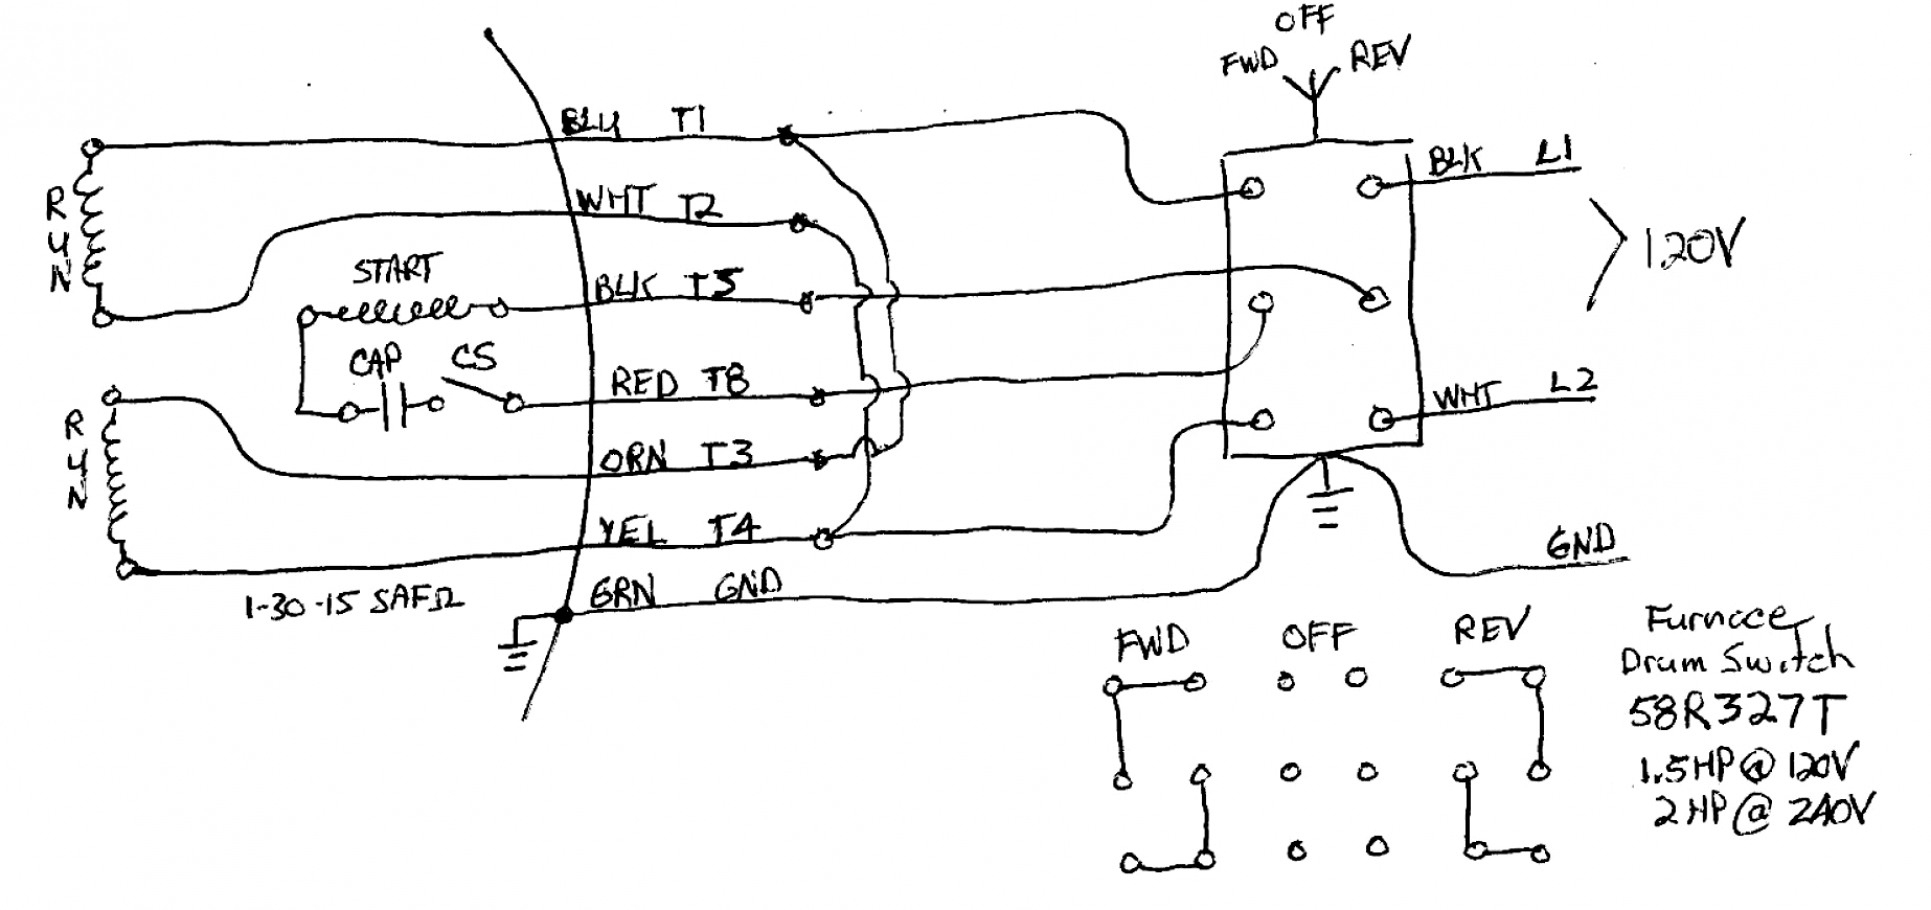 Century Electric Motors Wiring Diagram - All Wiring Diagram Data - Baldor Motors Wiring Diagram